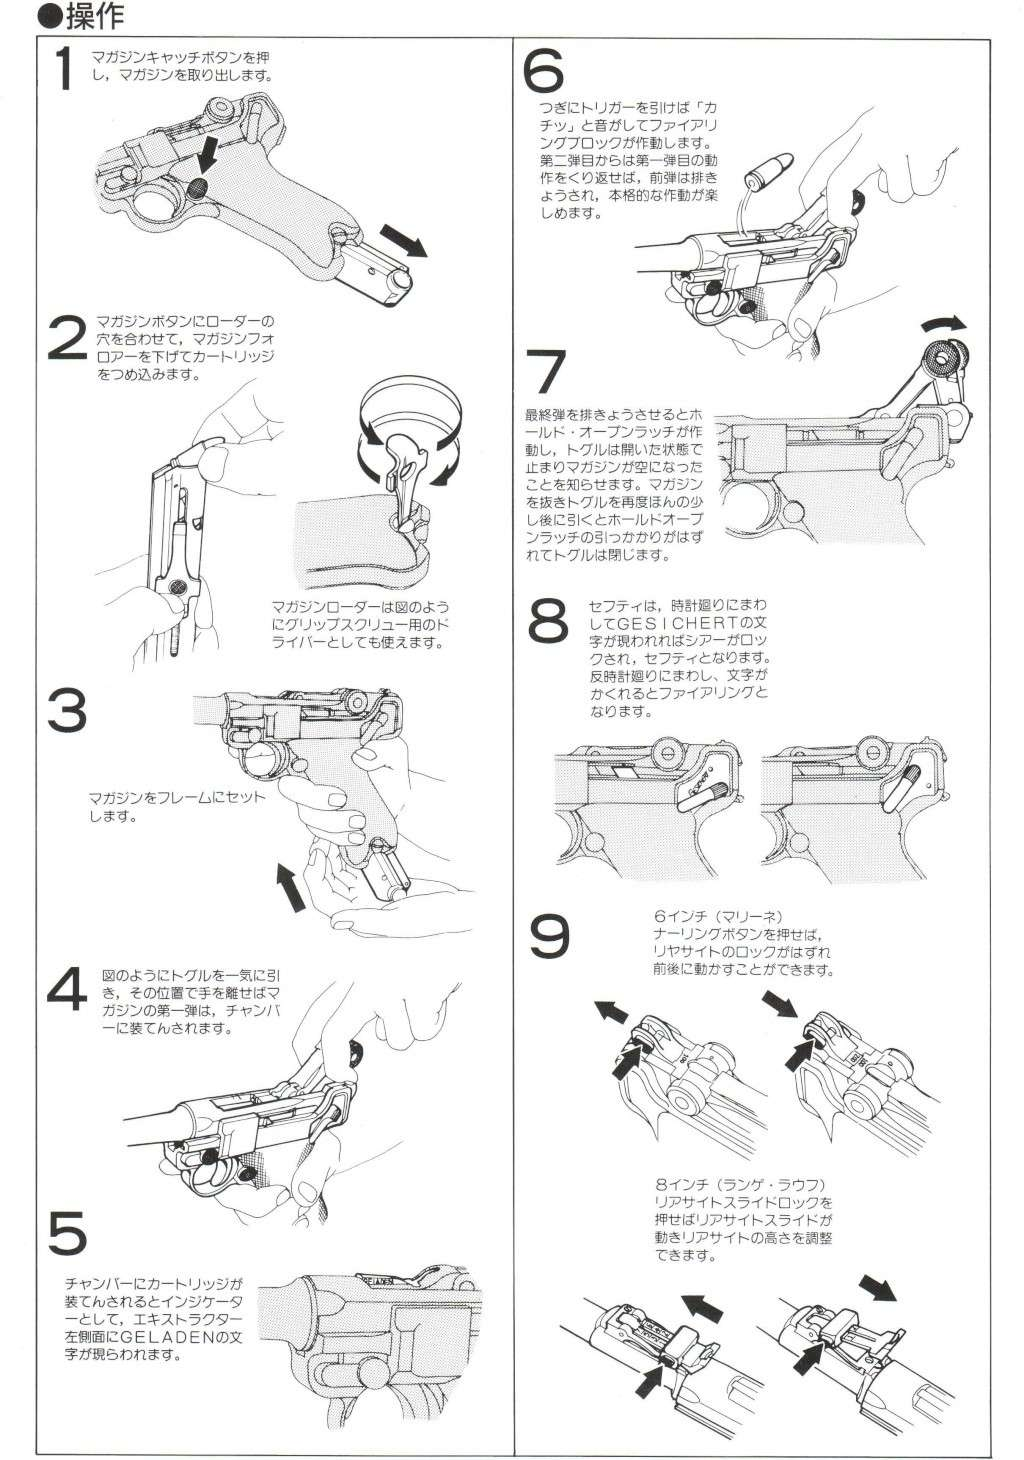 Marushin Metal KIT Dummy Cartridge Model LUGER P08 cal. 9 mm Instruction Manual B10